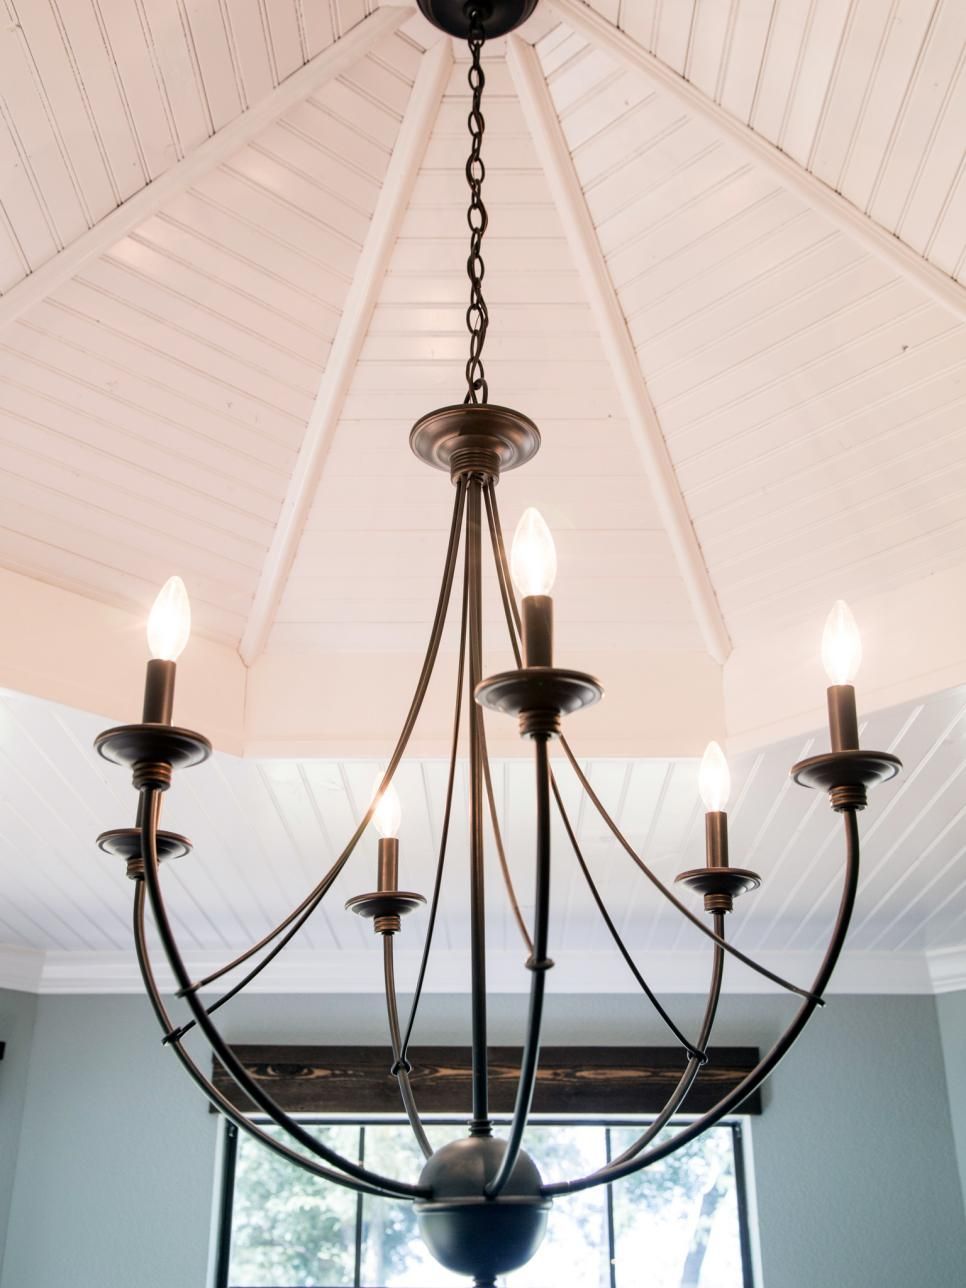 Tools & Home Improvement : Lighting